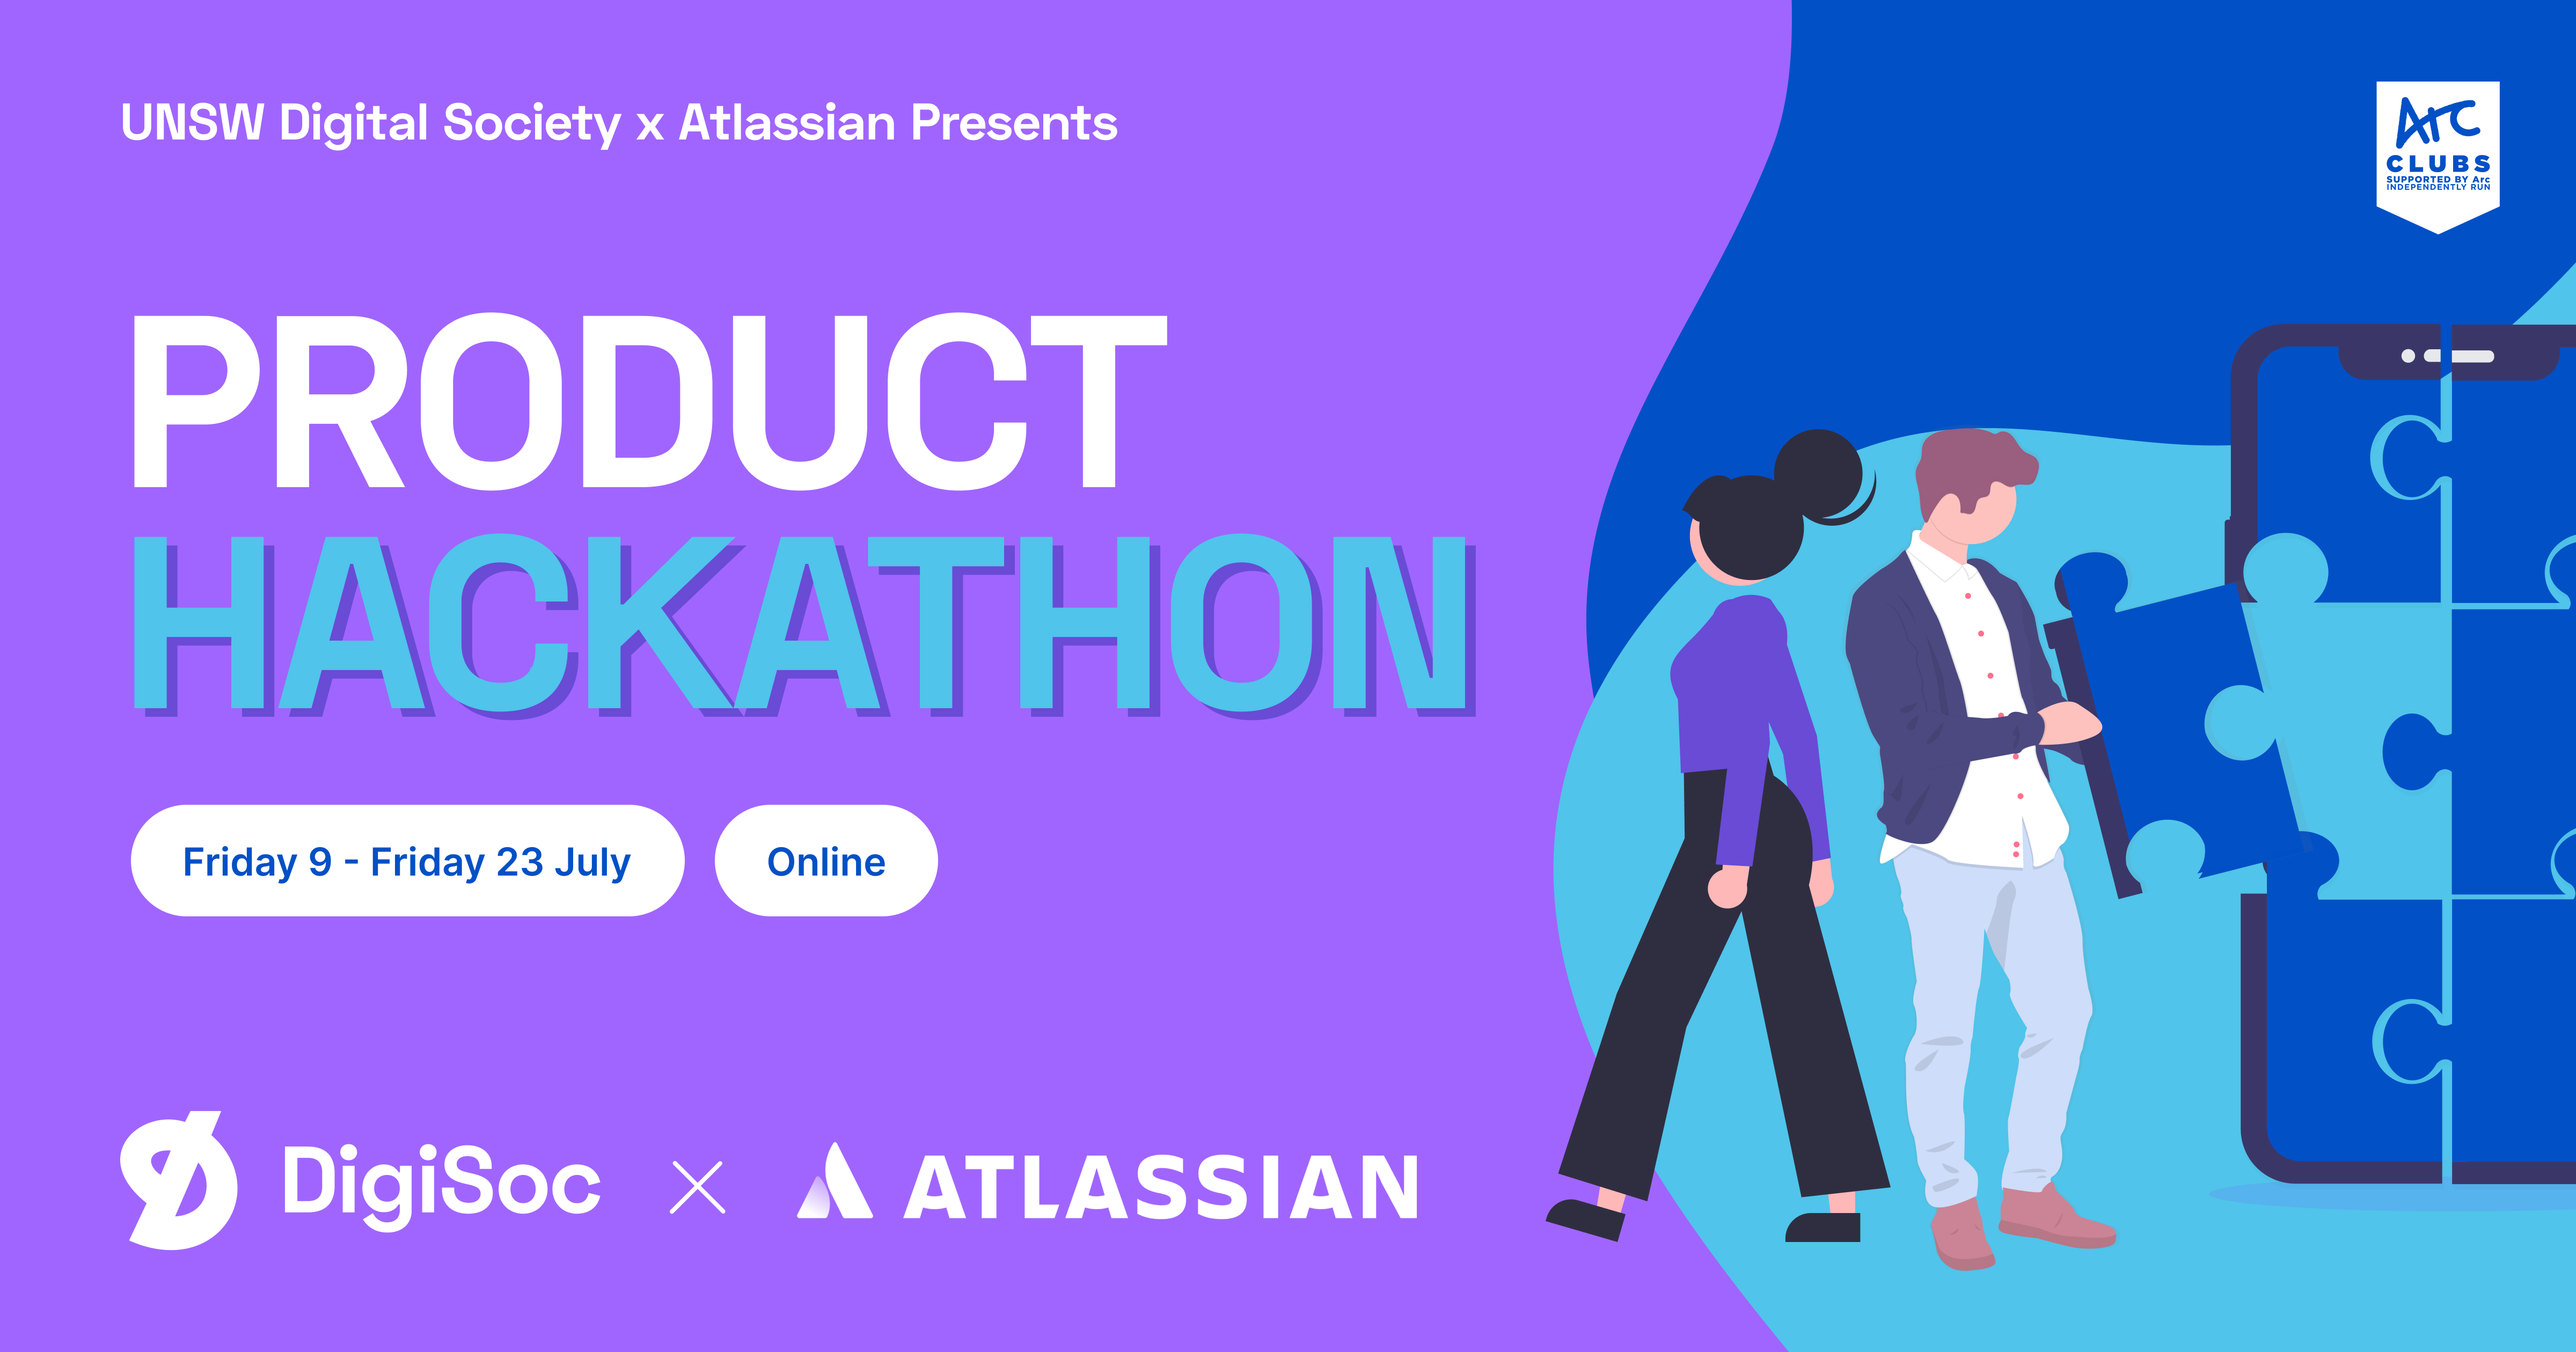 DigiSoc x Atlassian: Product Hackathon